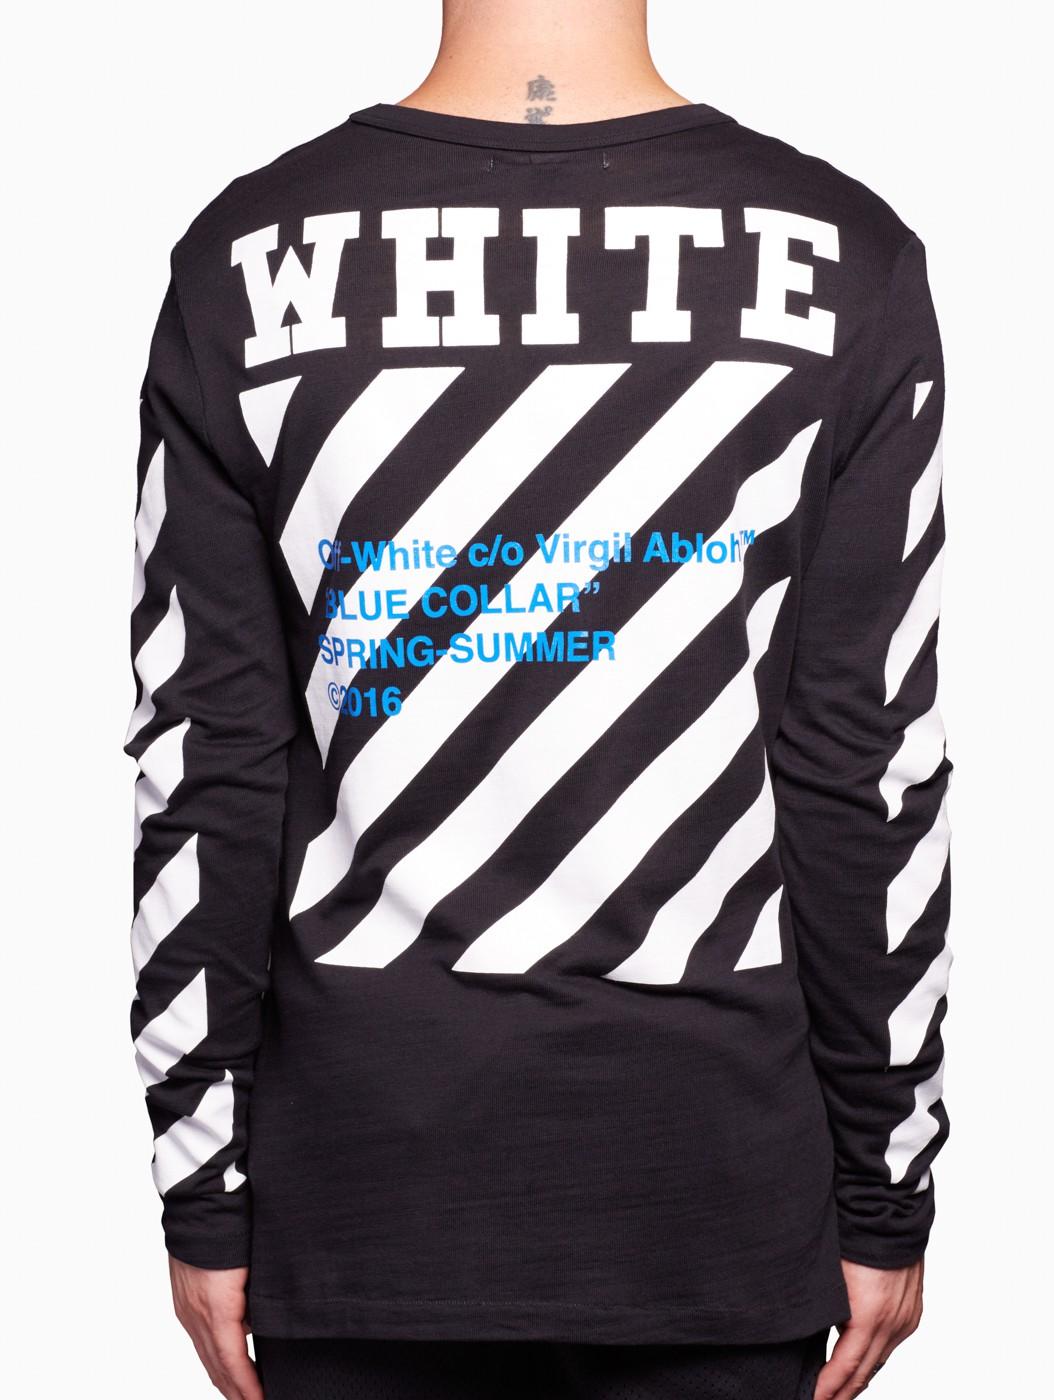 Off-White c o Virgil Abloh Blue Collar Ls Tee in Black for Men - Lyst 868deb1ac